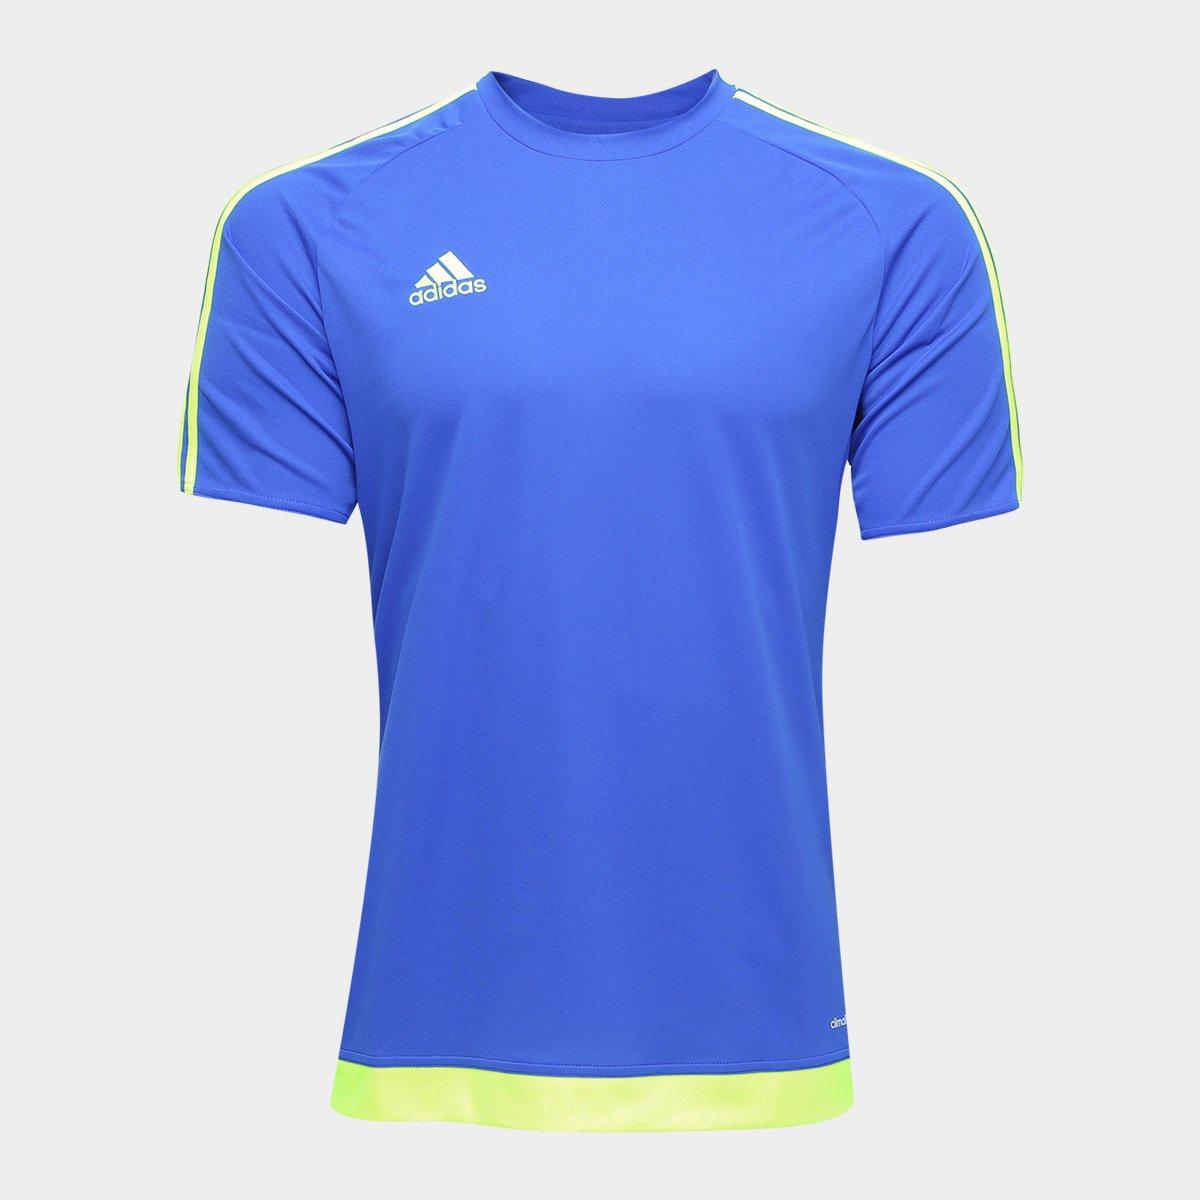 Camisa Adidas Estro 15 Masculina - Azul Escuro - Compre Agora ... f3cc1f80fc4a4